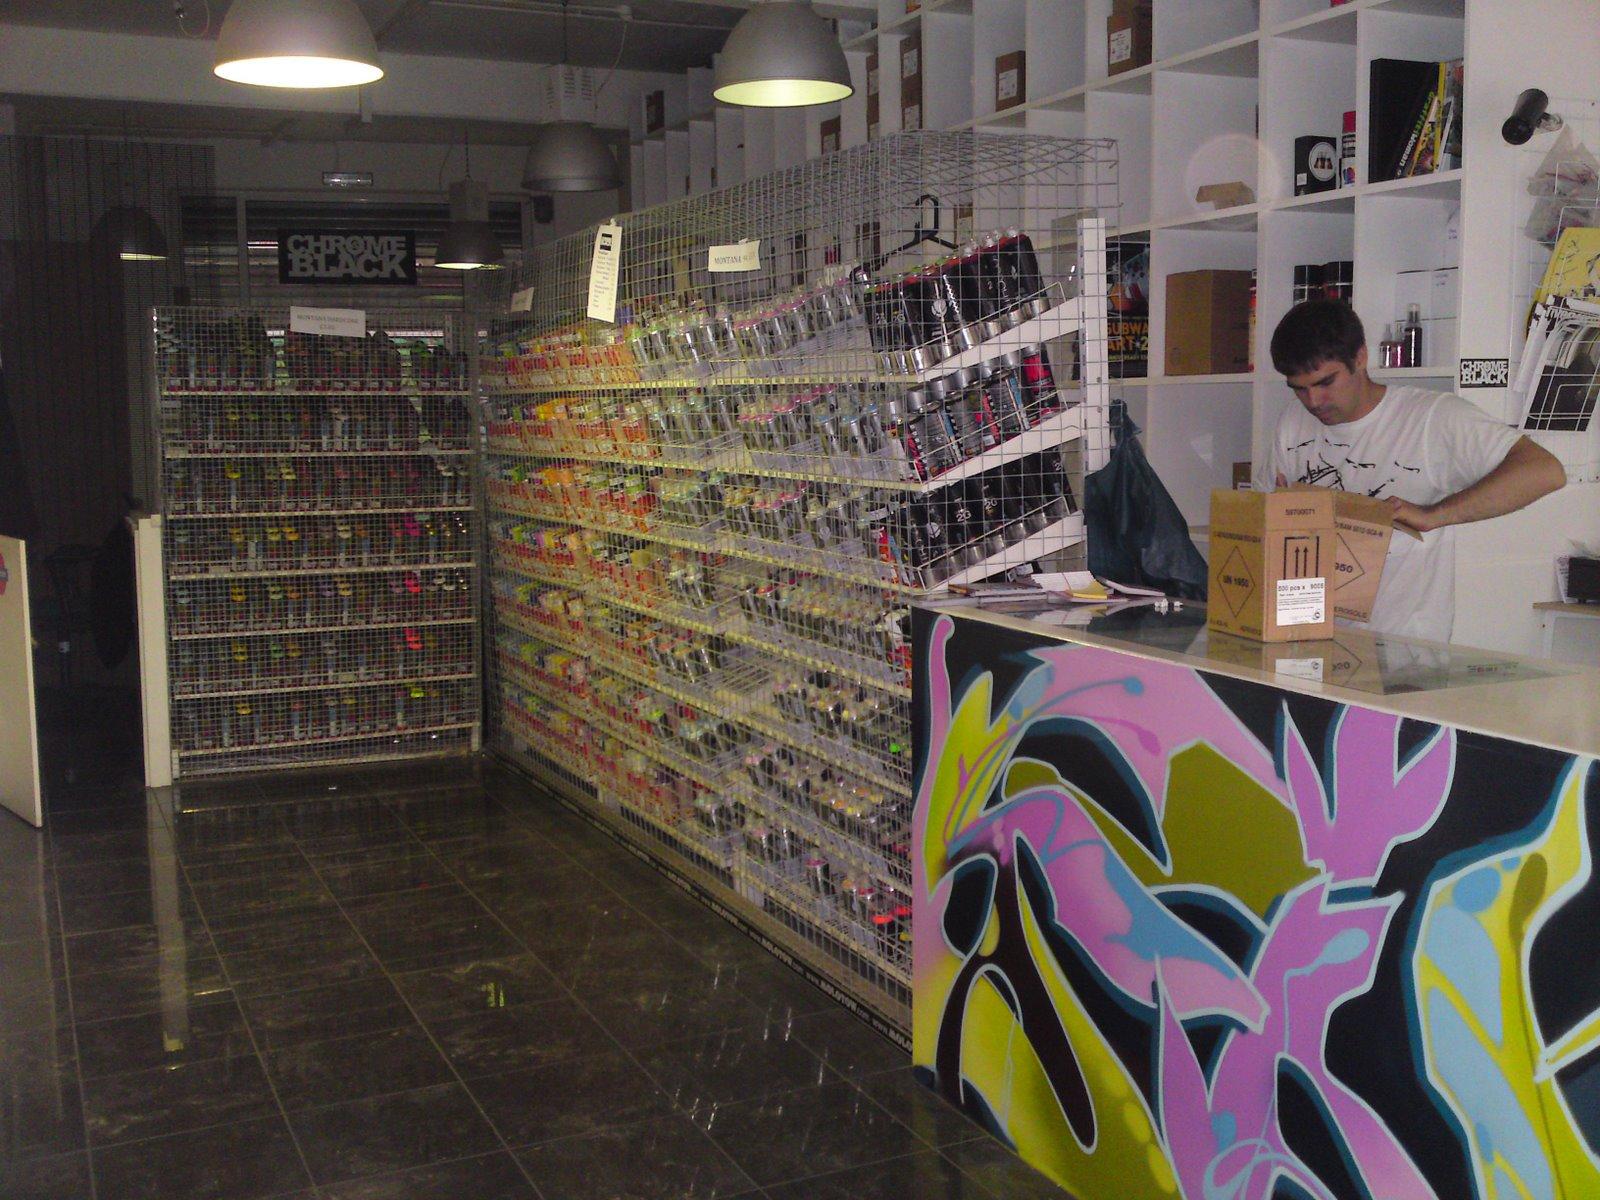 Chrome & Black Graffiti Store | Hookedblog — UK Street Art